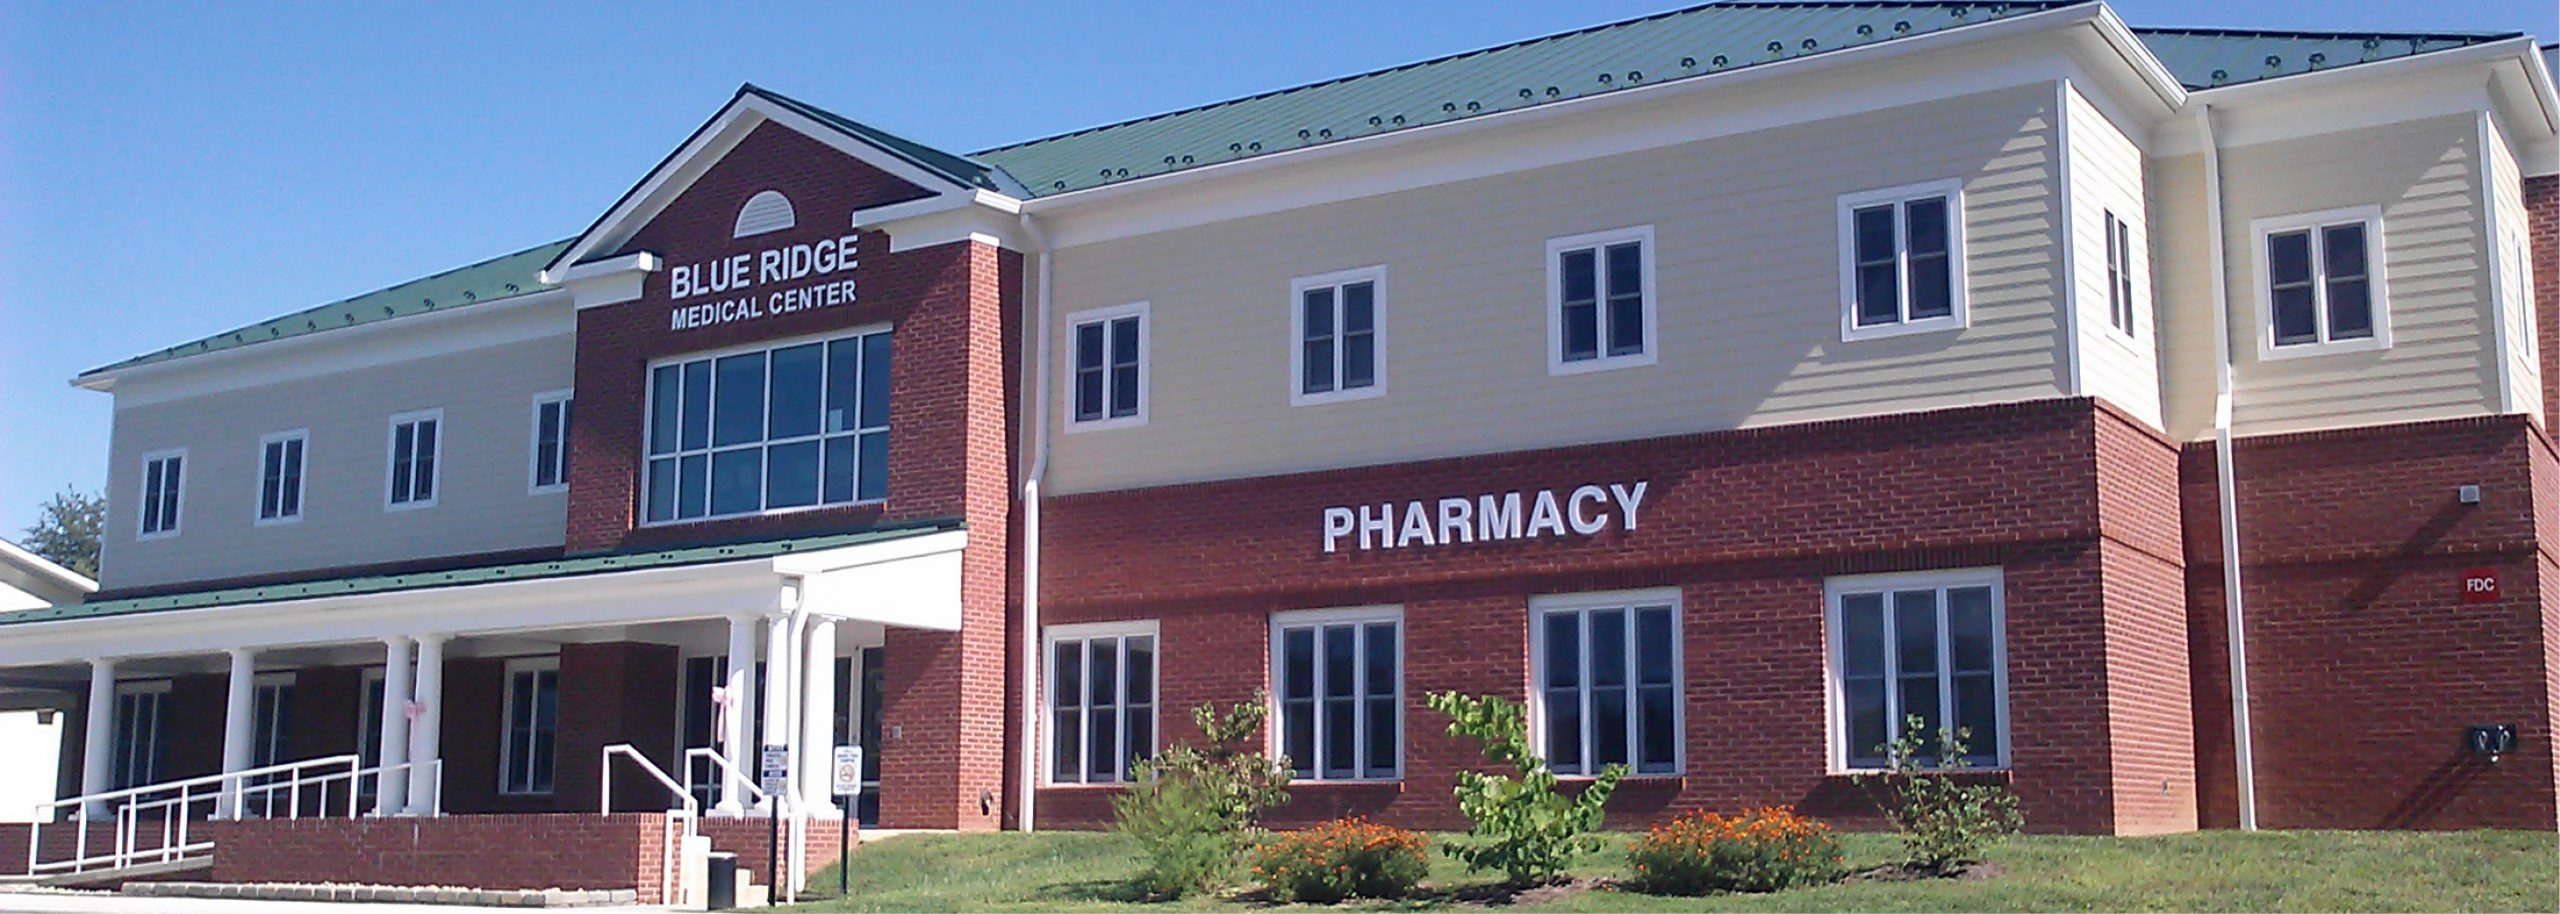 Blue Ridge Medical Center Building